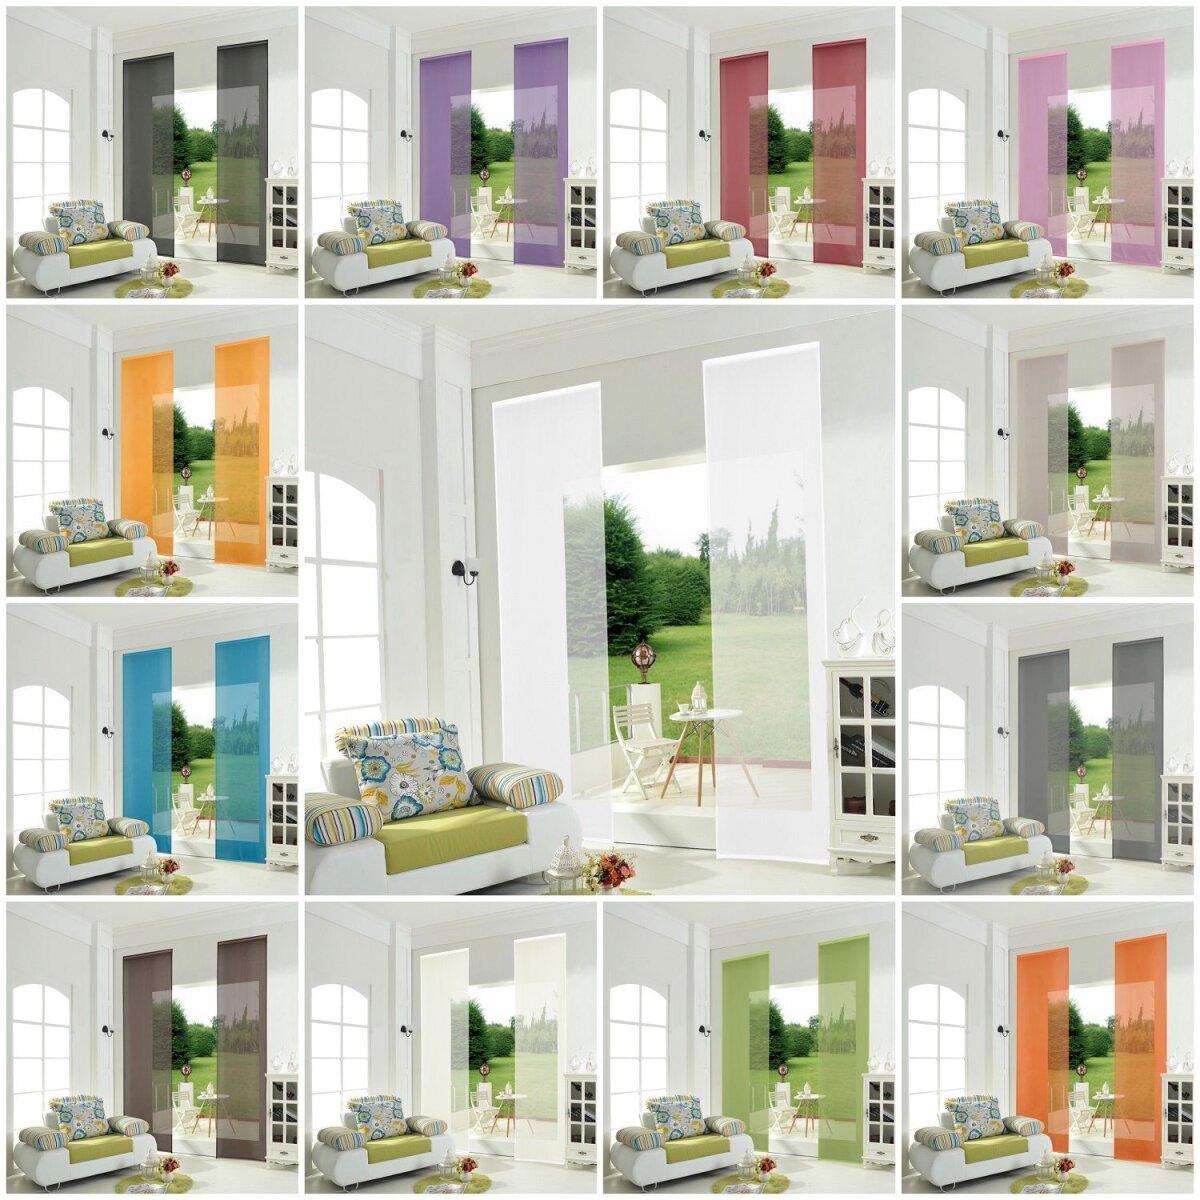 855892 2er pack schiebepanel schiebegardine fl chenvorhang u. Black Bedroom Furniture Sets. Home Design Ideas